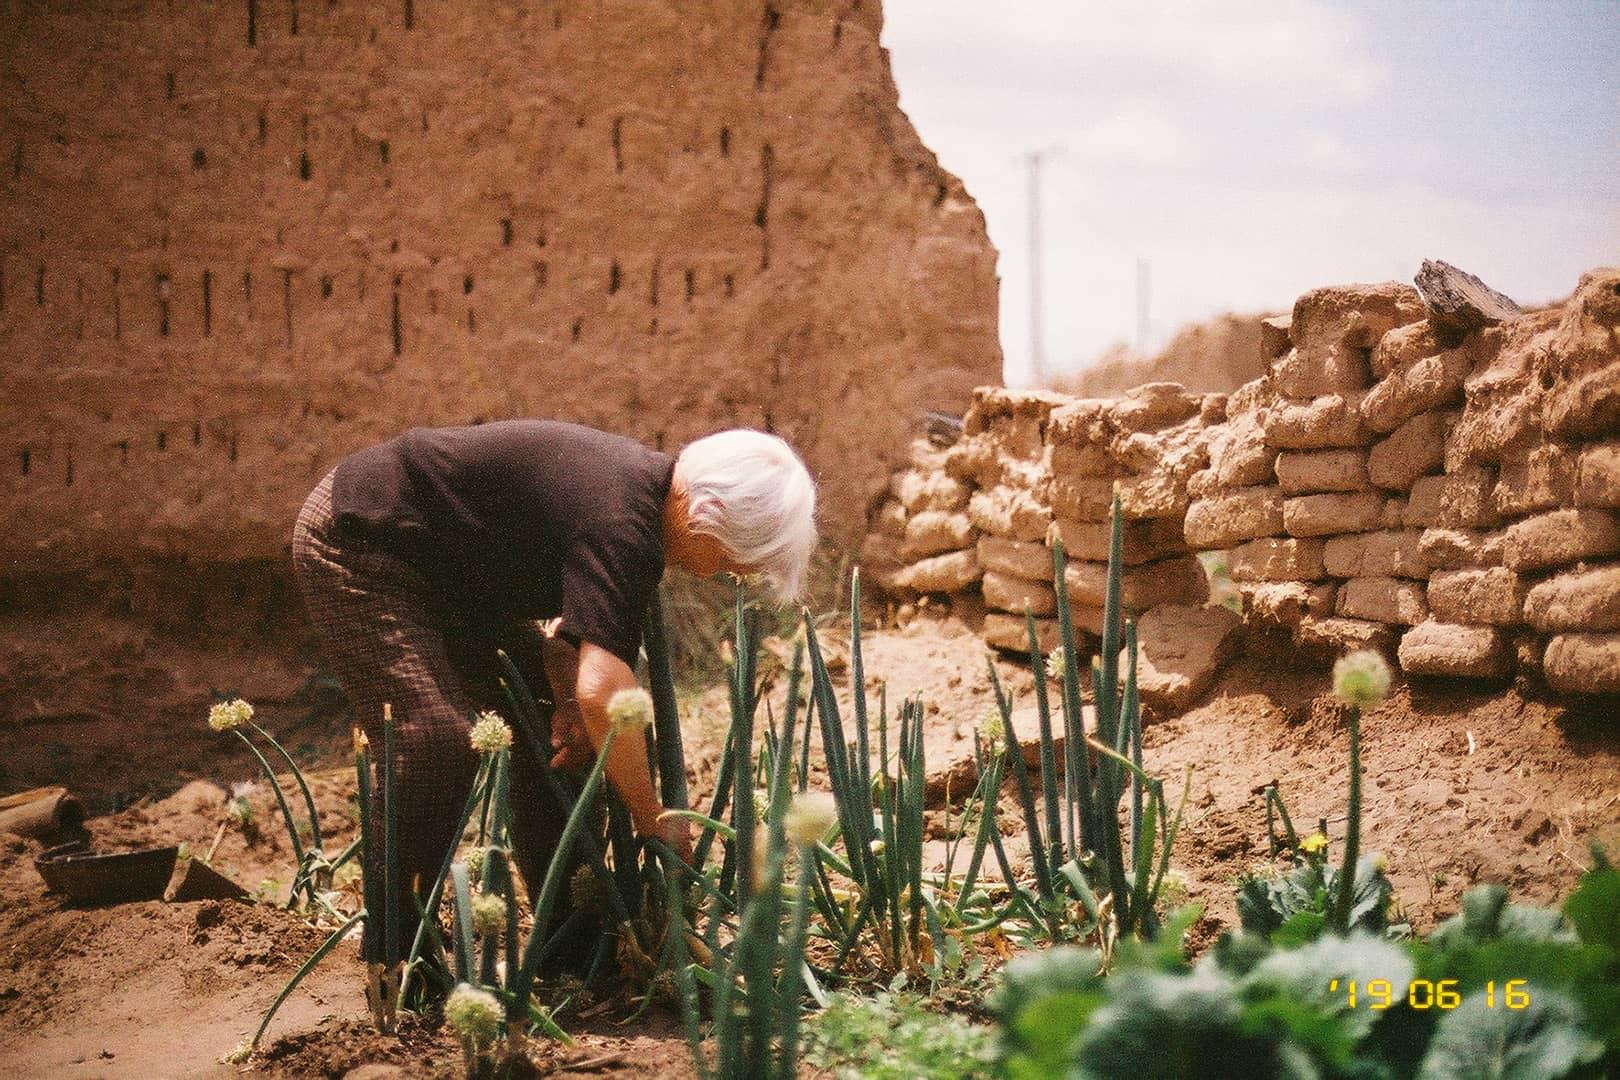 摘葱叶的老人